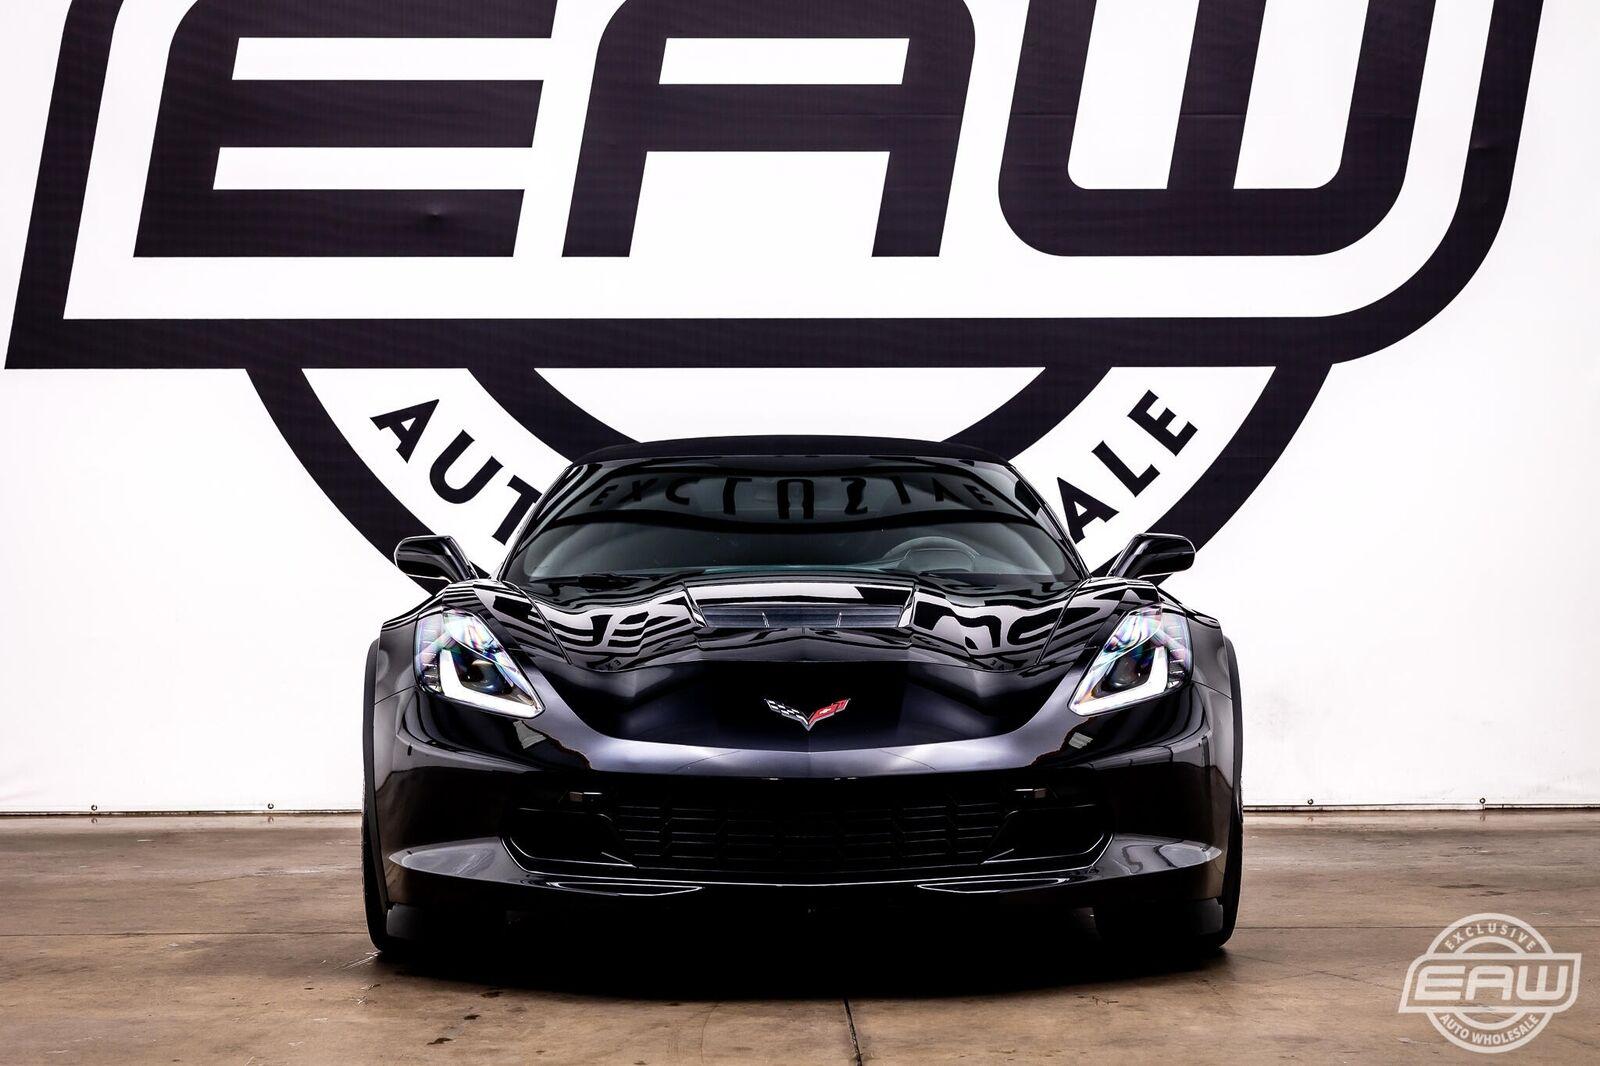 2019 Black Chevrolet Corvette Convertible 2LT | C7 Corvette Photo 5